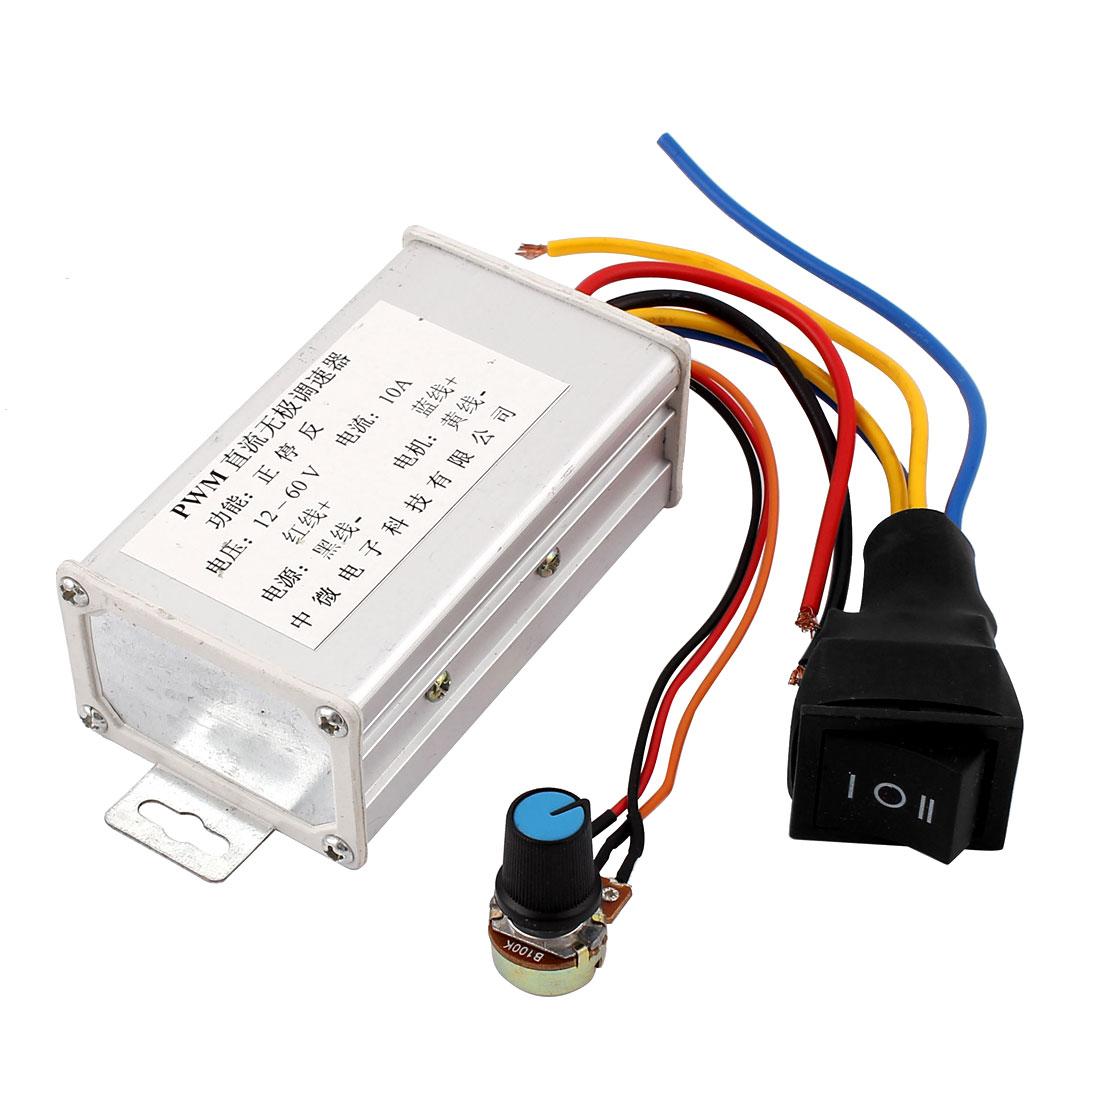 12V-60V 10A Pulse Width Modulator PWM DC Motor Speed Controller Regulator